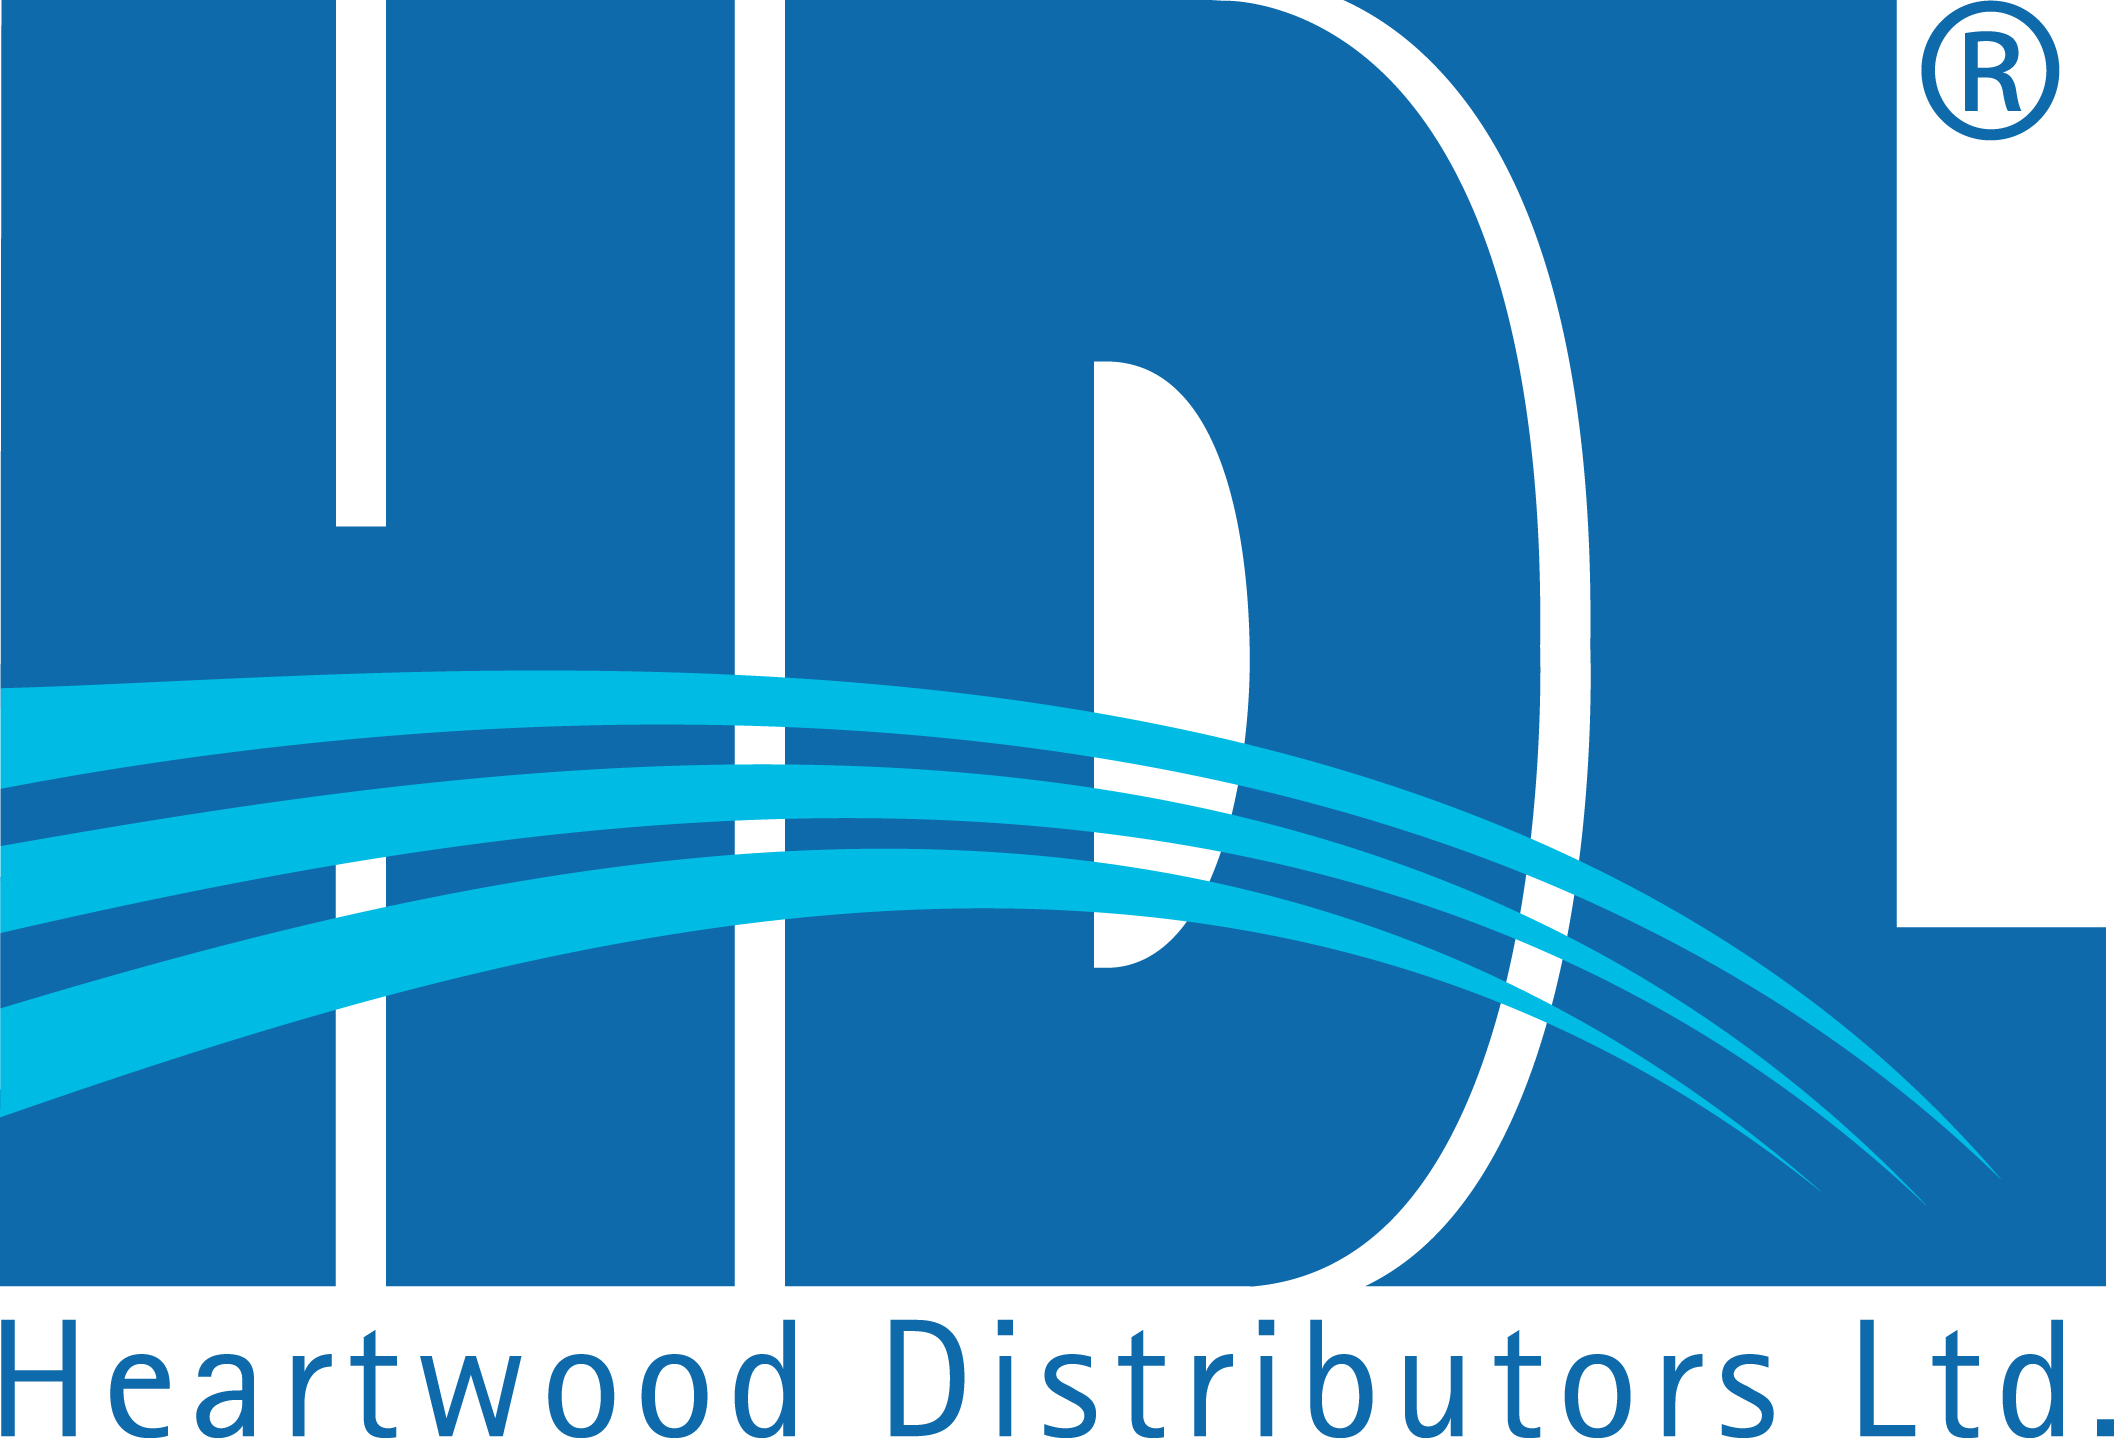 Heartwood Distributors Ltd